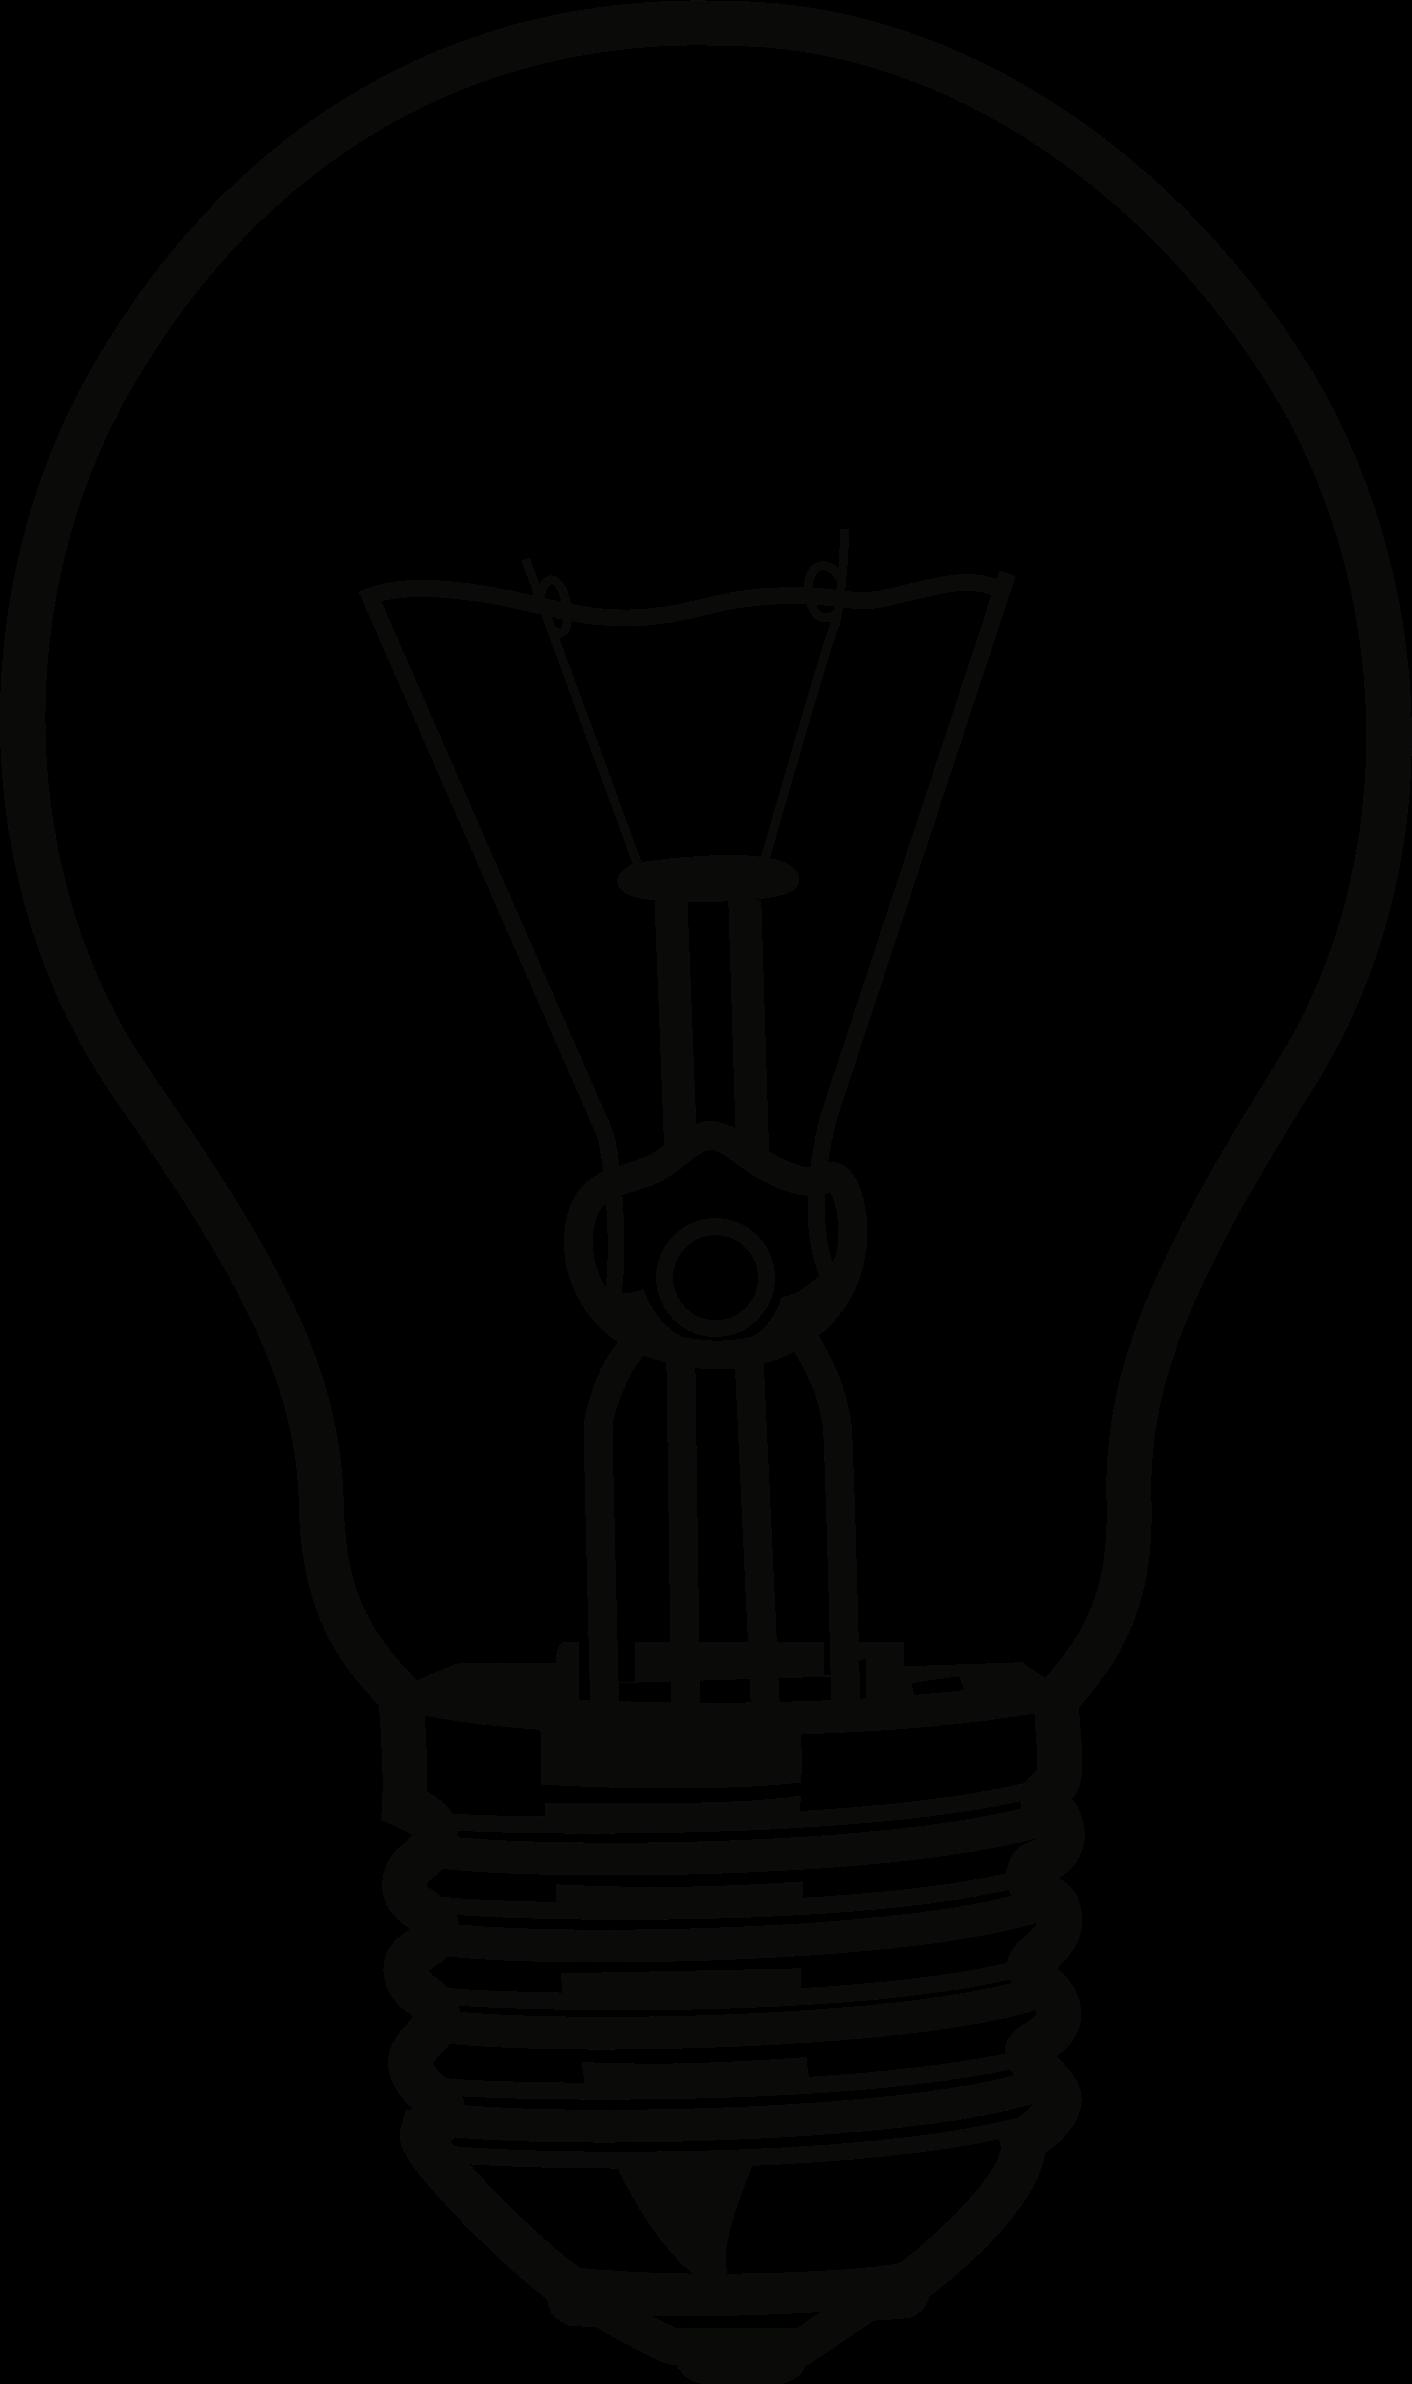 Light bulb big image. Lights clipart buld